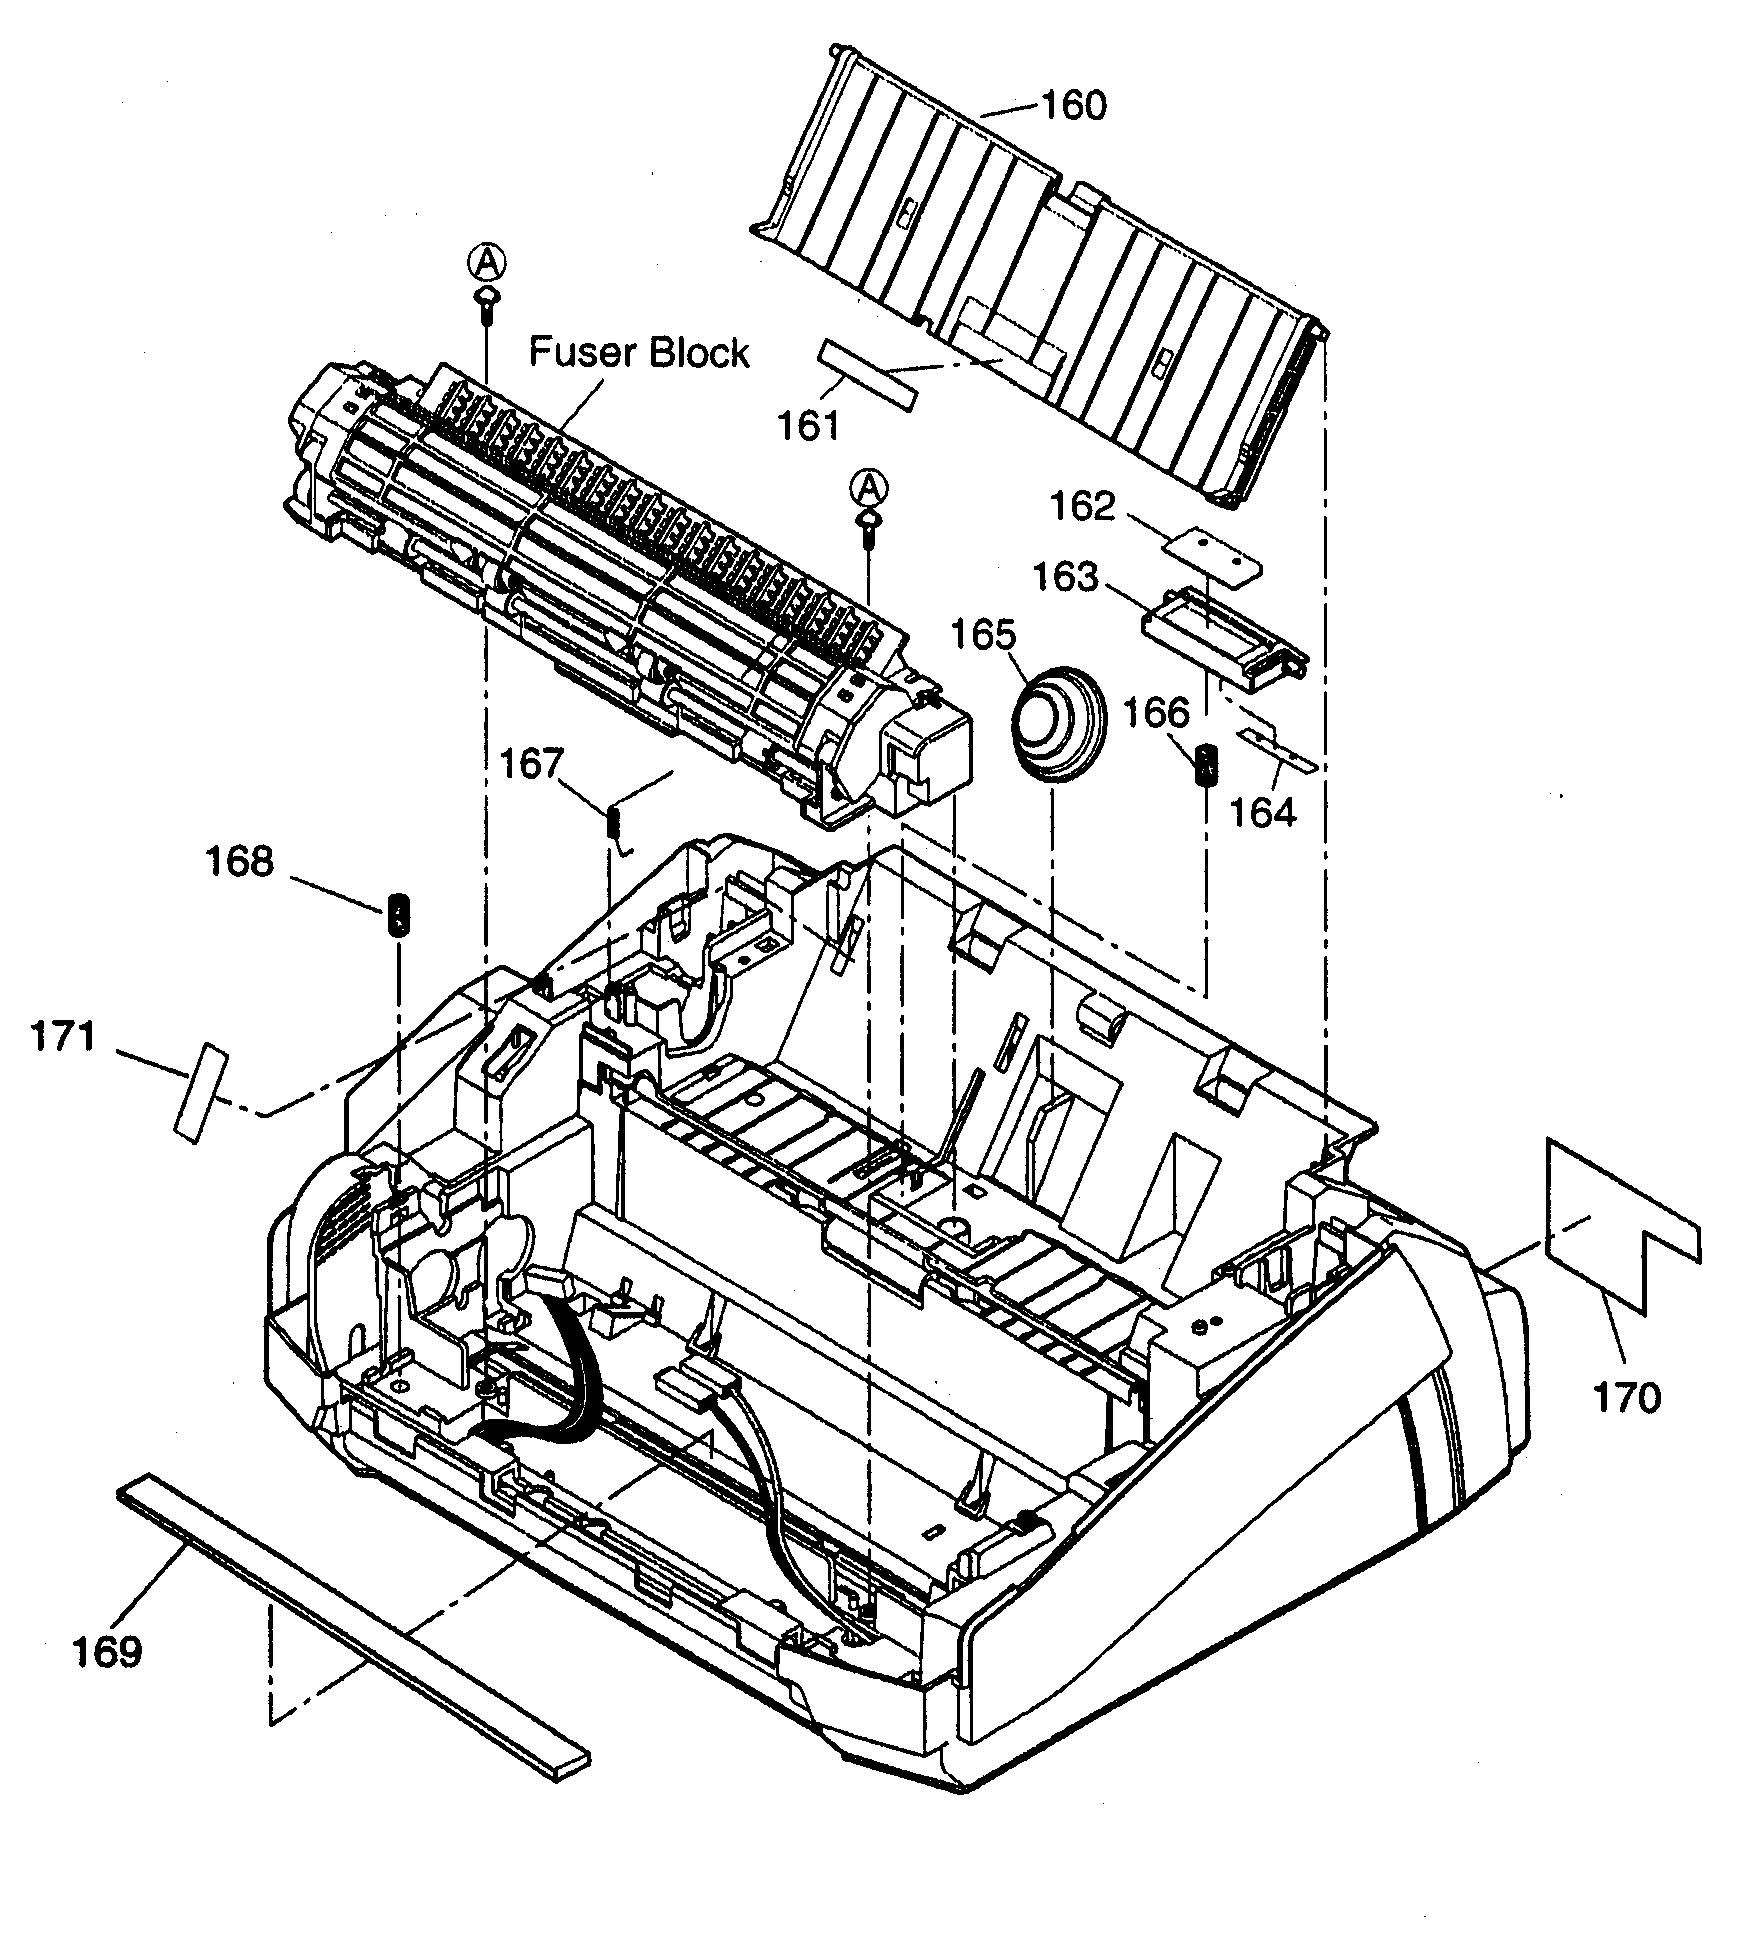 Fax Machine Drawing At Getdrawings